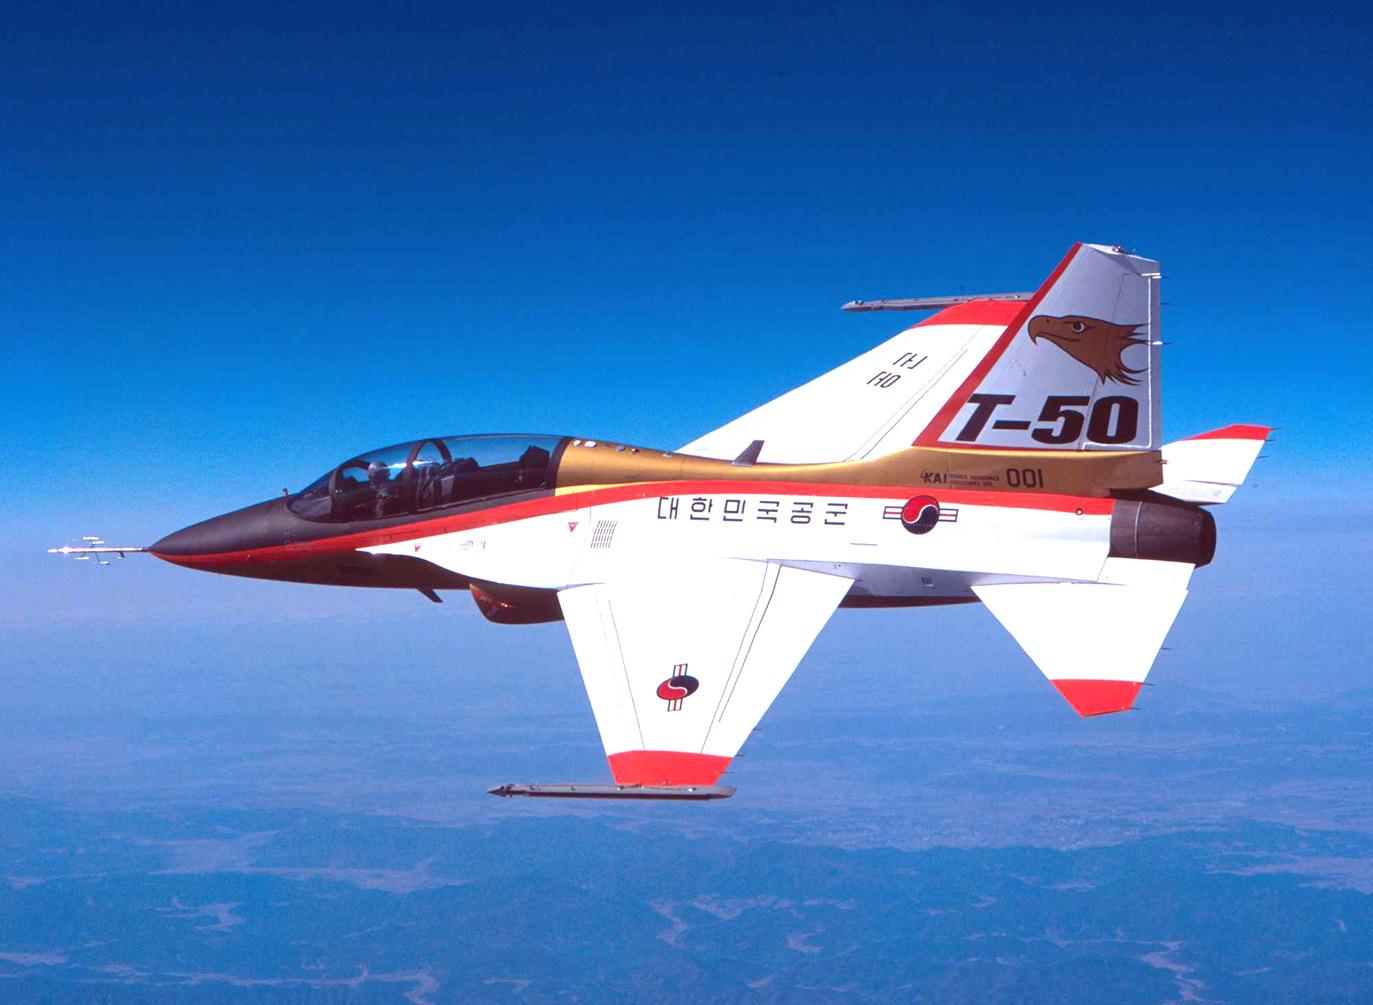 KAI T-50 Golden Eagle T-50%2520Golden%2520Eagle